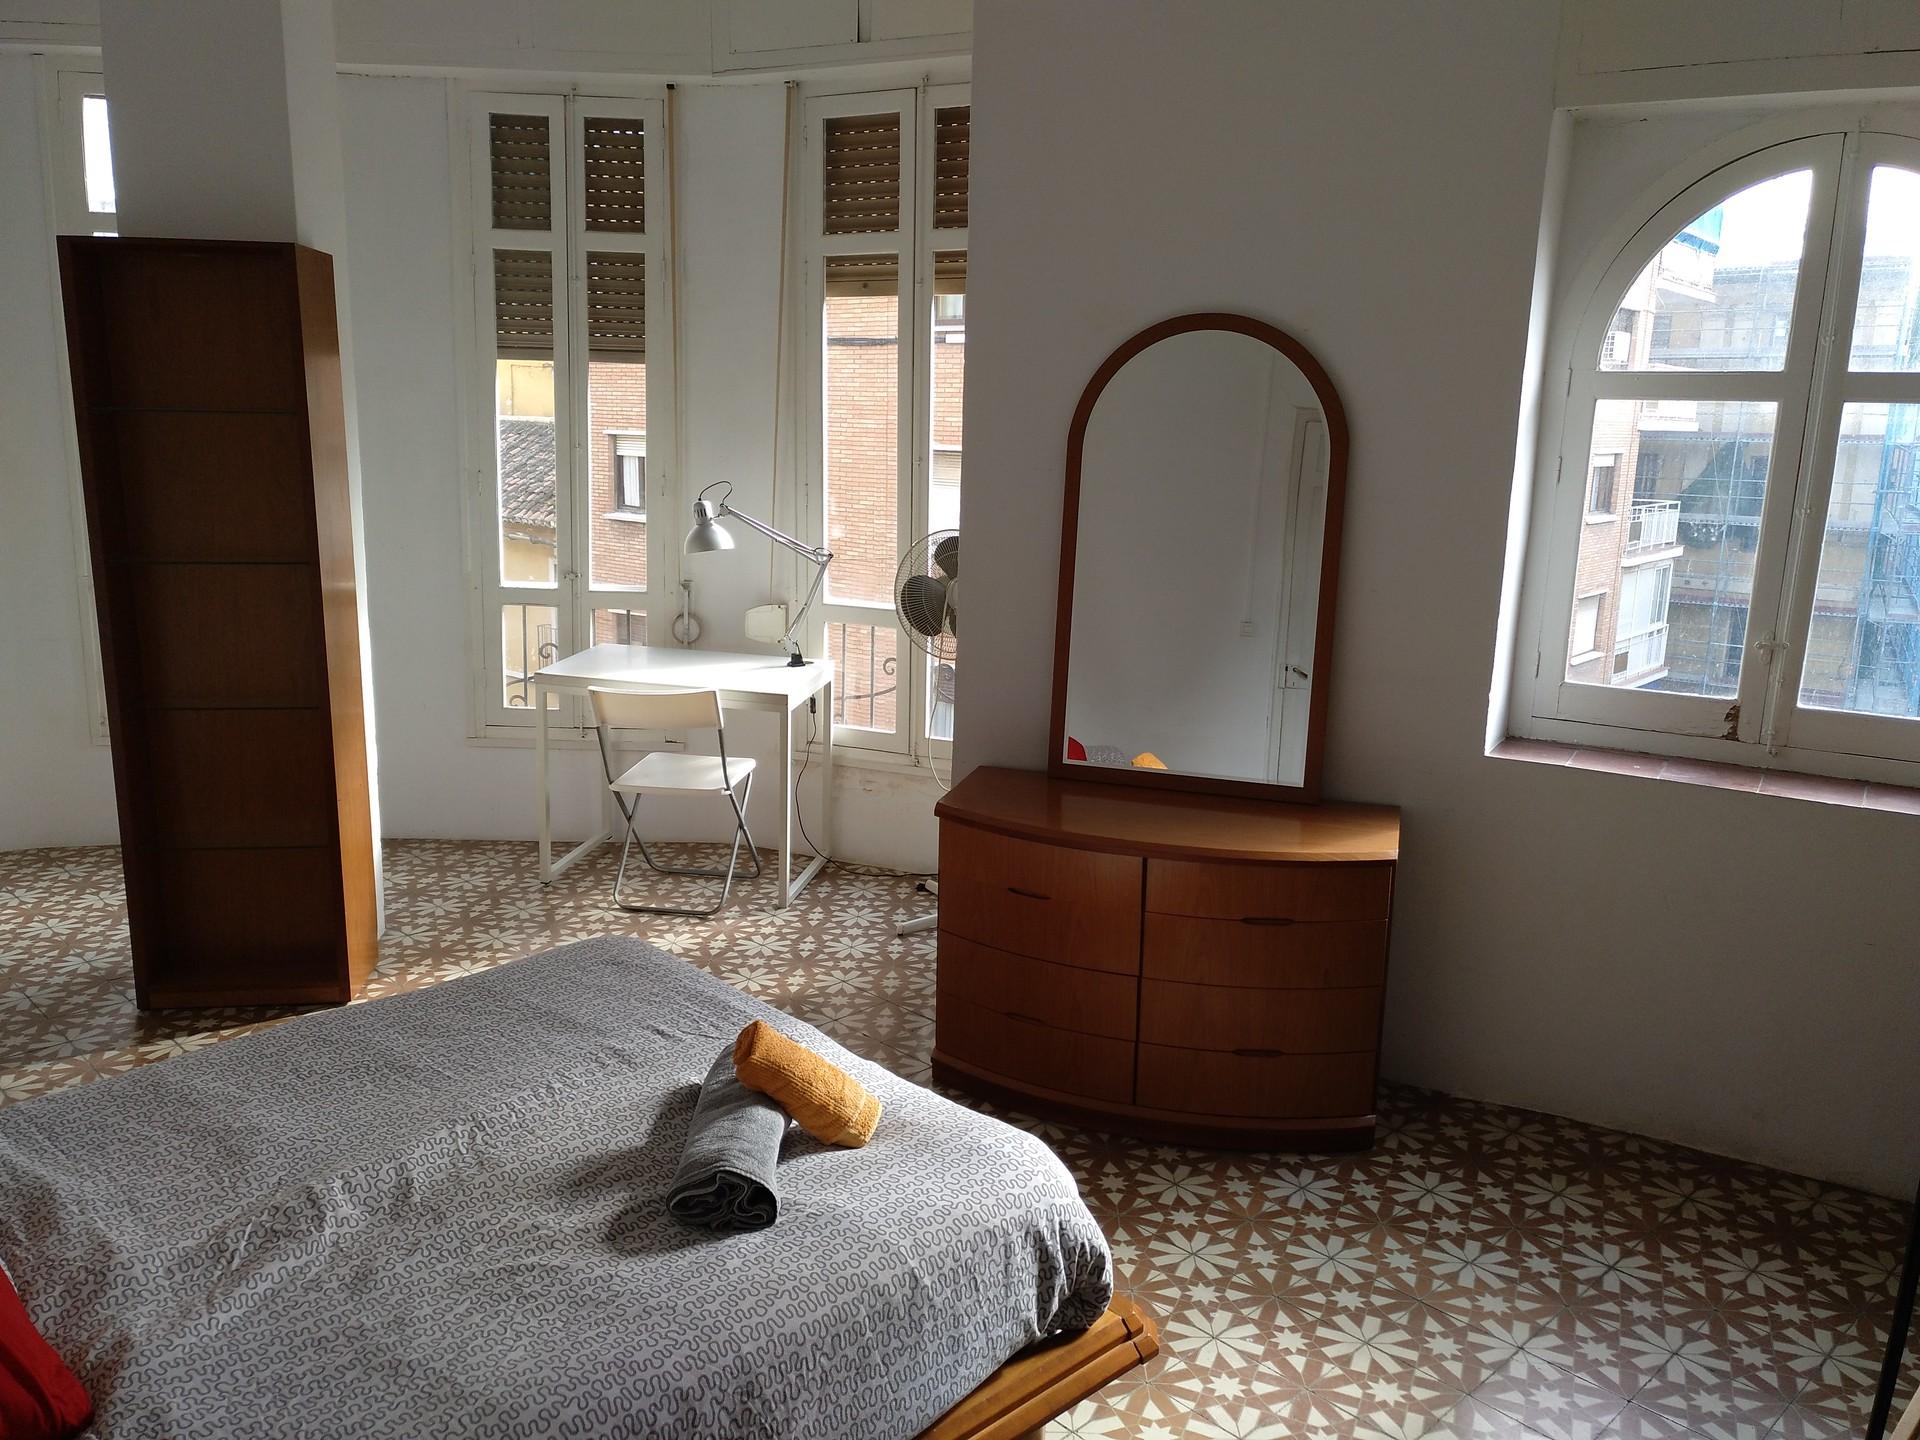 huge-double-bedroom-lot-light-923ad91206521be77174abd1841d44f8